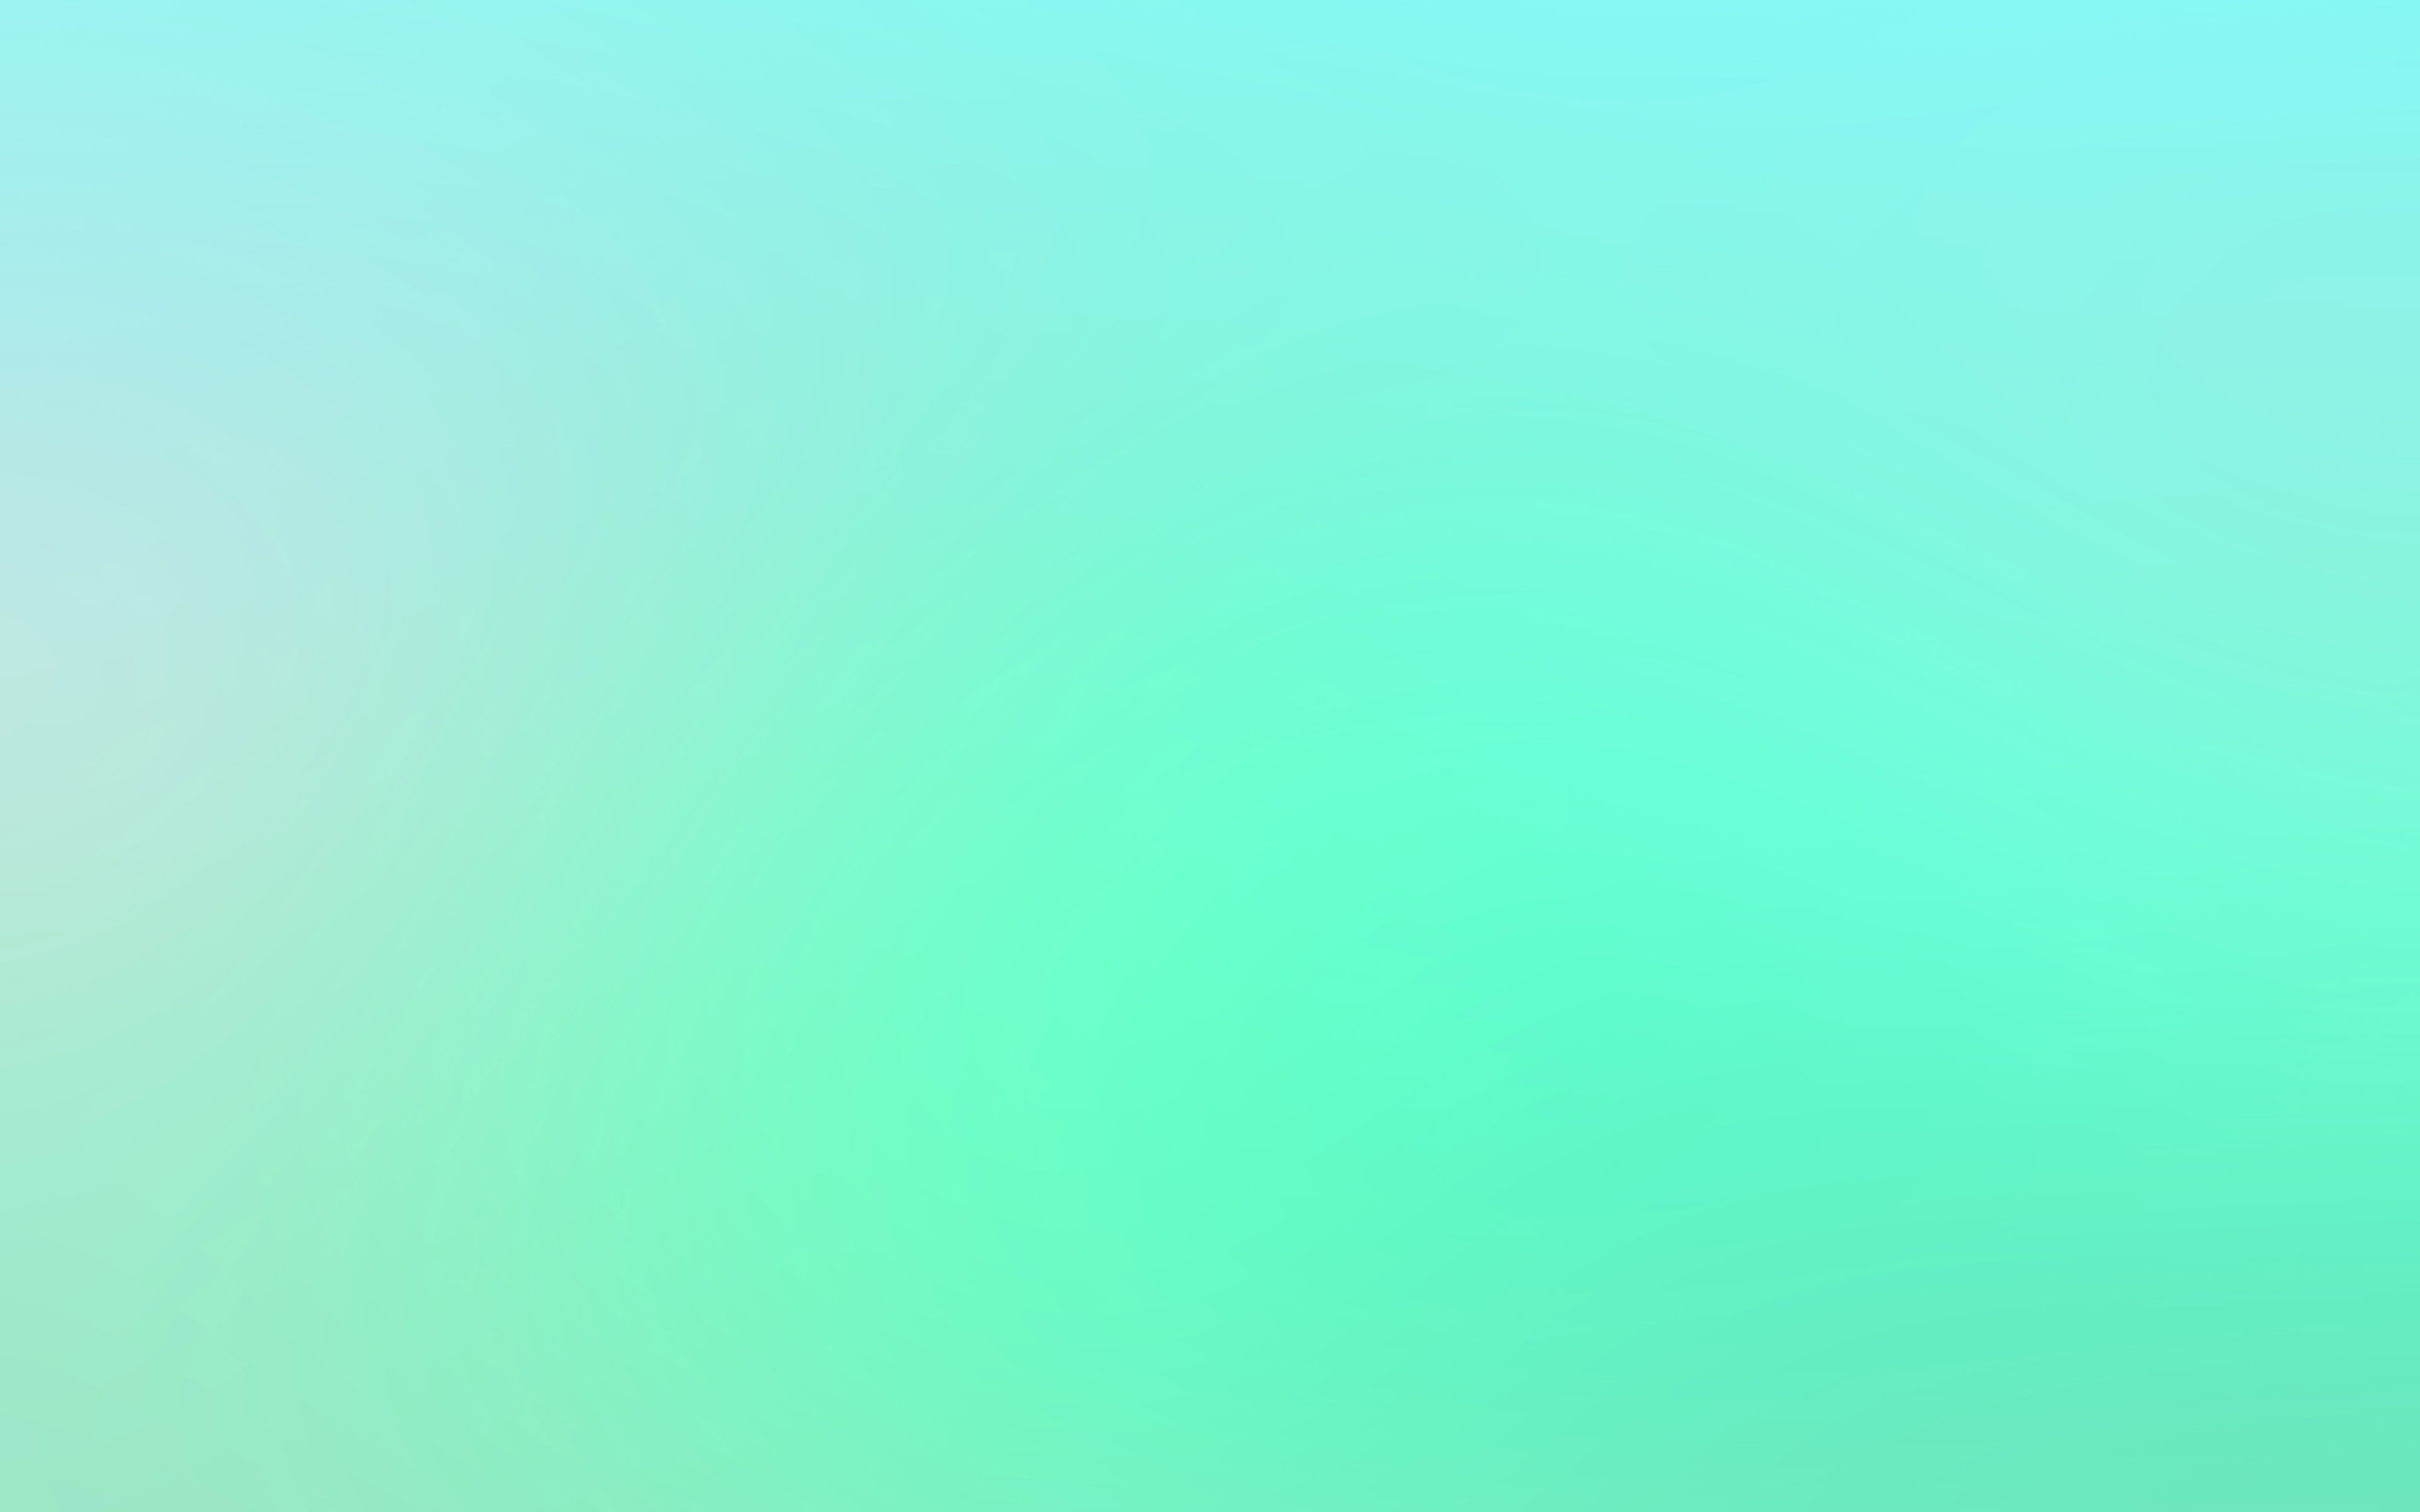 Sb39 Wallpaper Green Blue Pastel Blur Papers Co